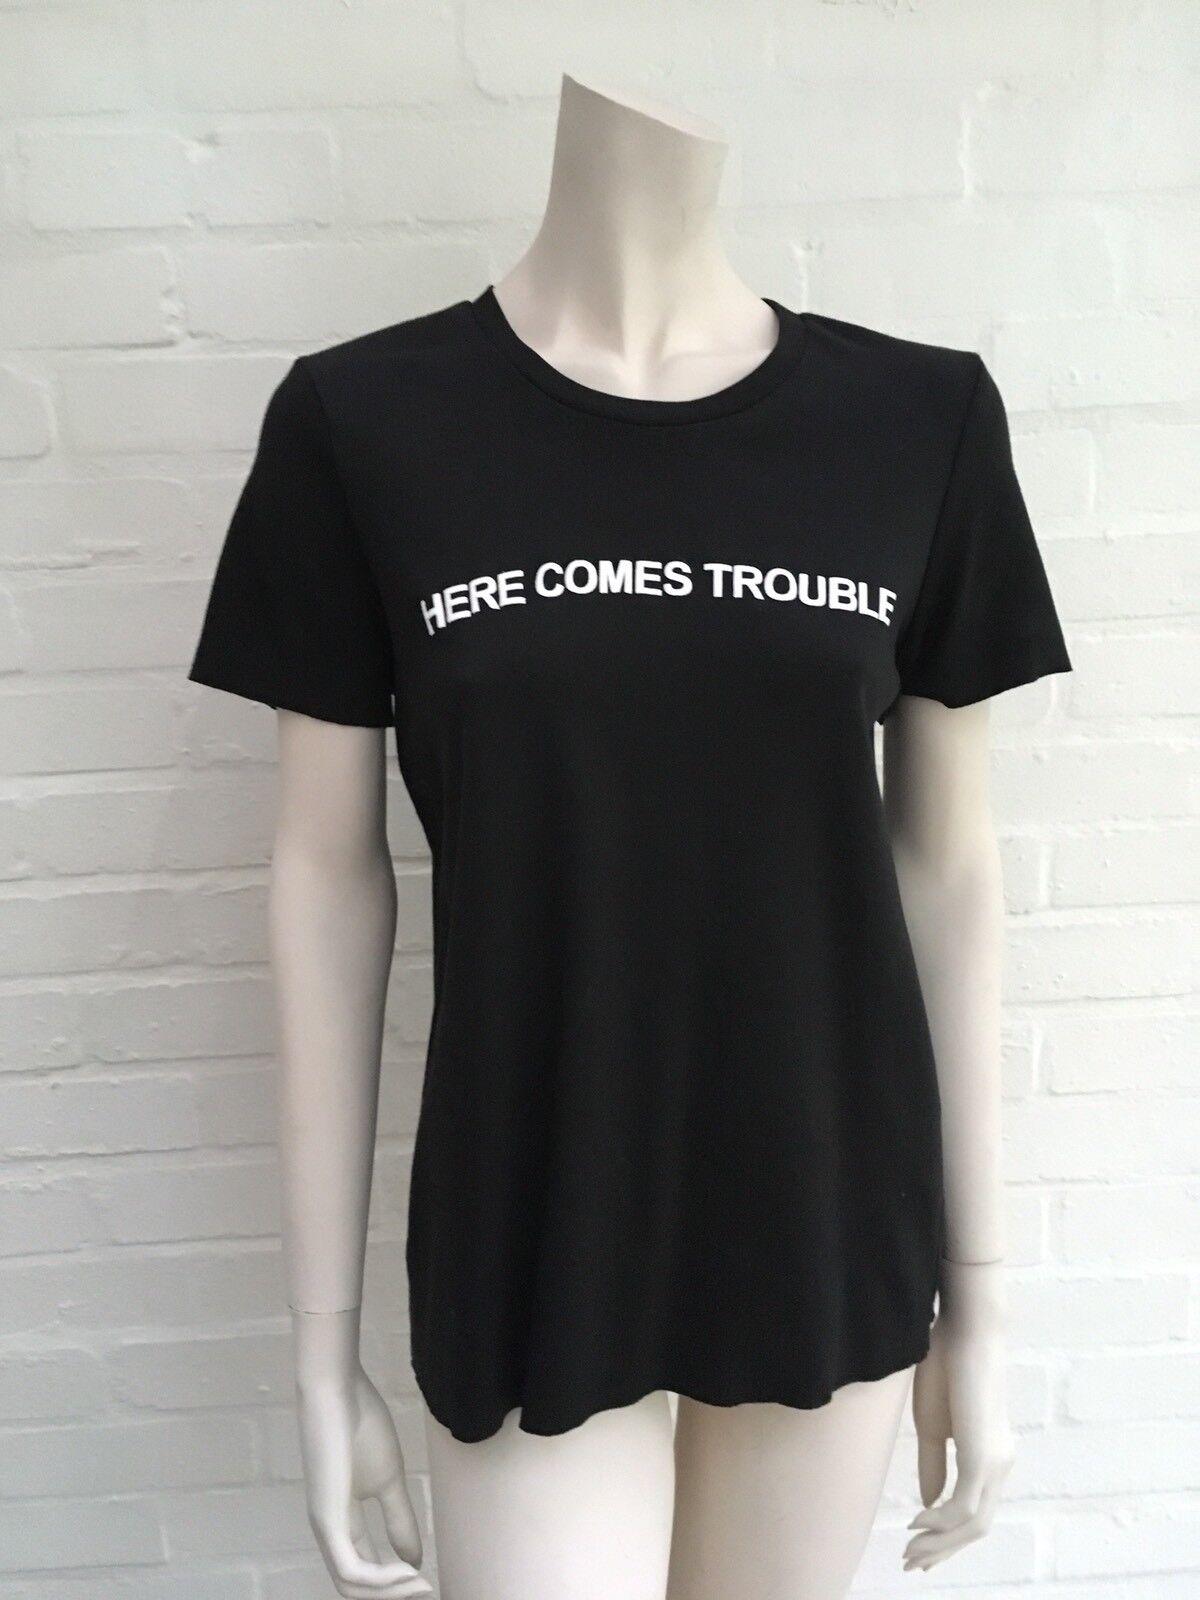 NATASHA ZINKO Here Comes Trouble schwarz T-shirt T shirt top Größe M MEDIUM